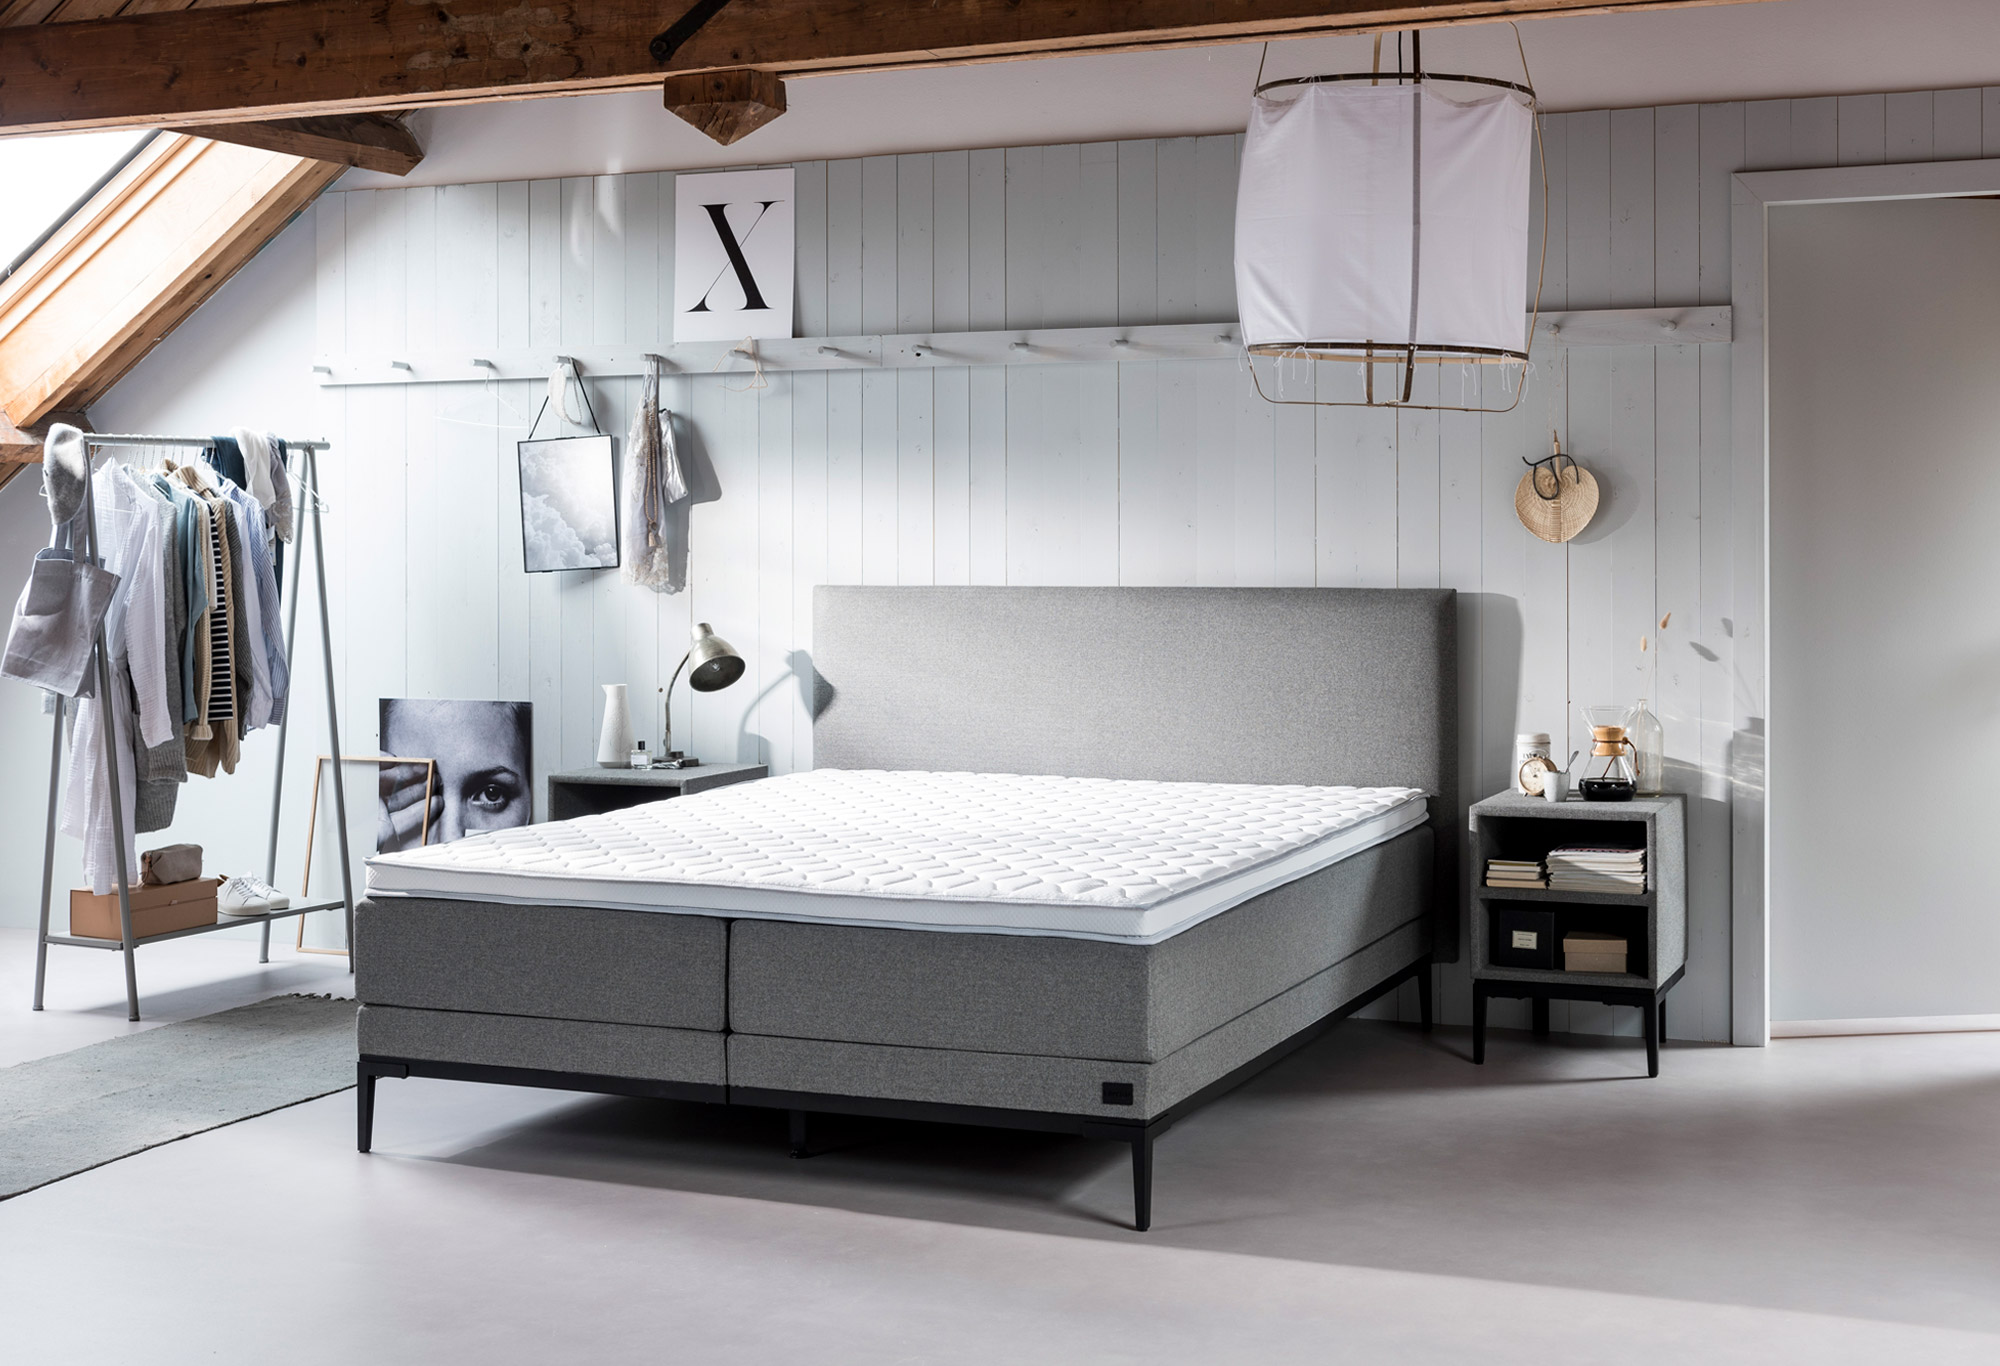 Vtwonen Bedbank Aanbieding.Boxspring Lifestyle By Vtwonen Thyme Swiss Sense